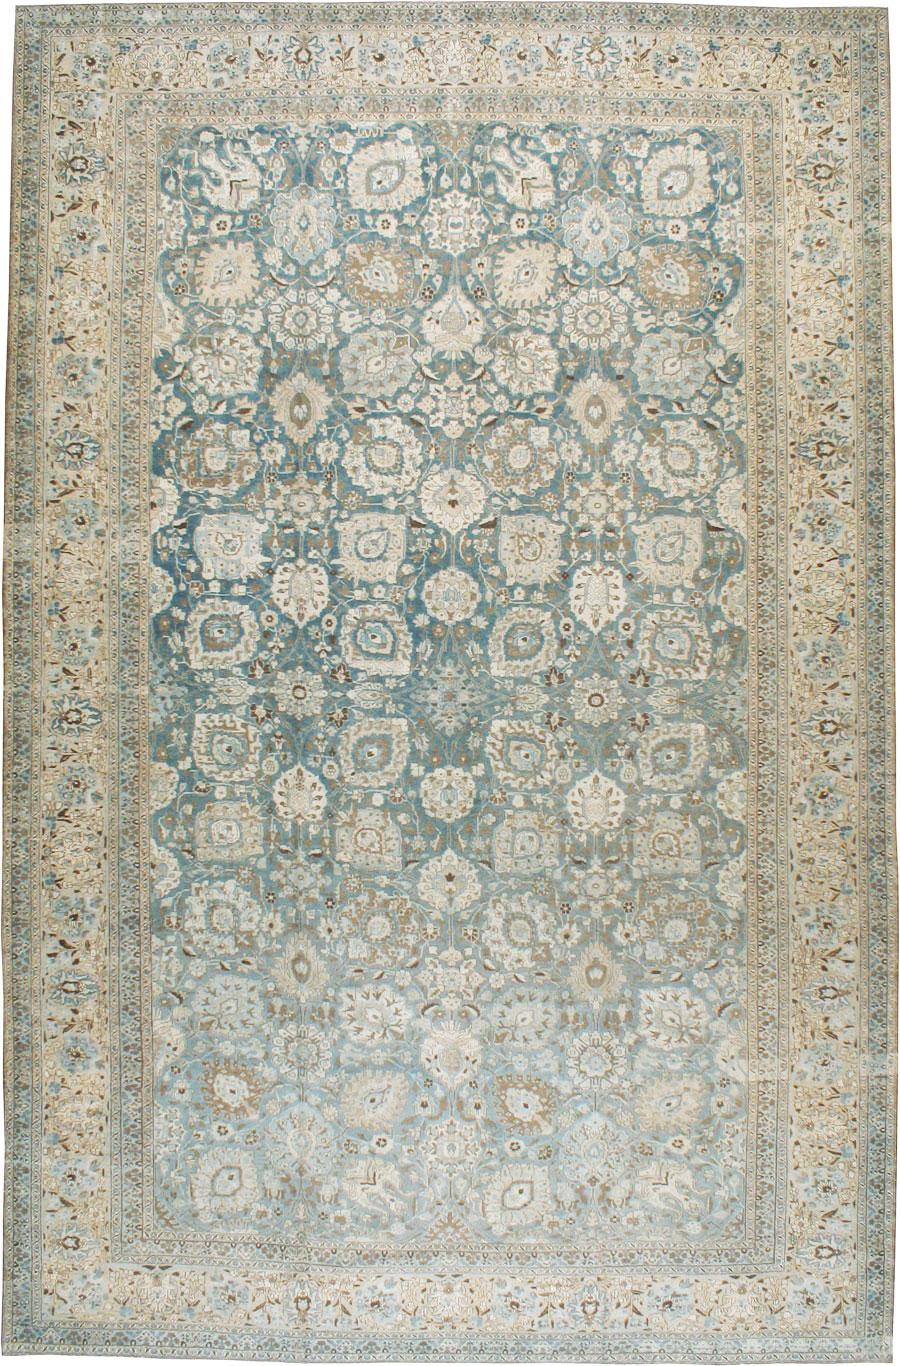 Antique Persian Tabriz Carpet No 17235